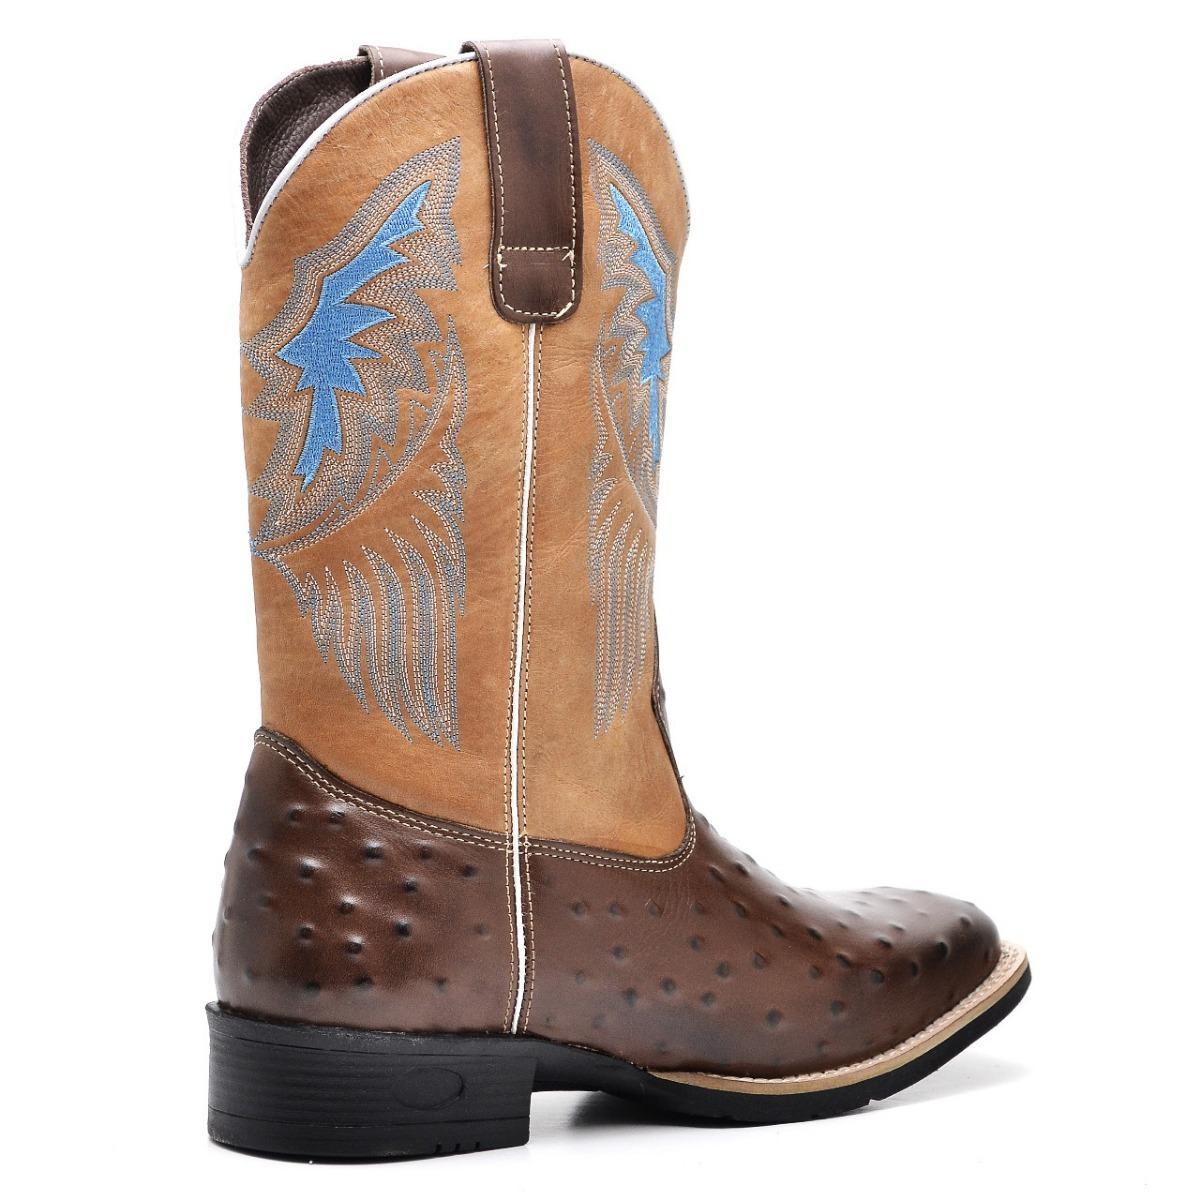 bota country masculina rodeio couro legitimo texana barretao. Carregando  zoom. 5a7414492df